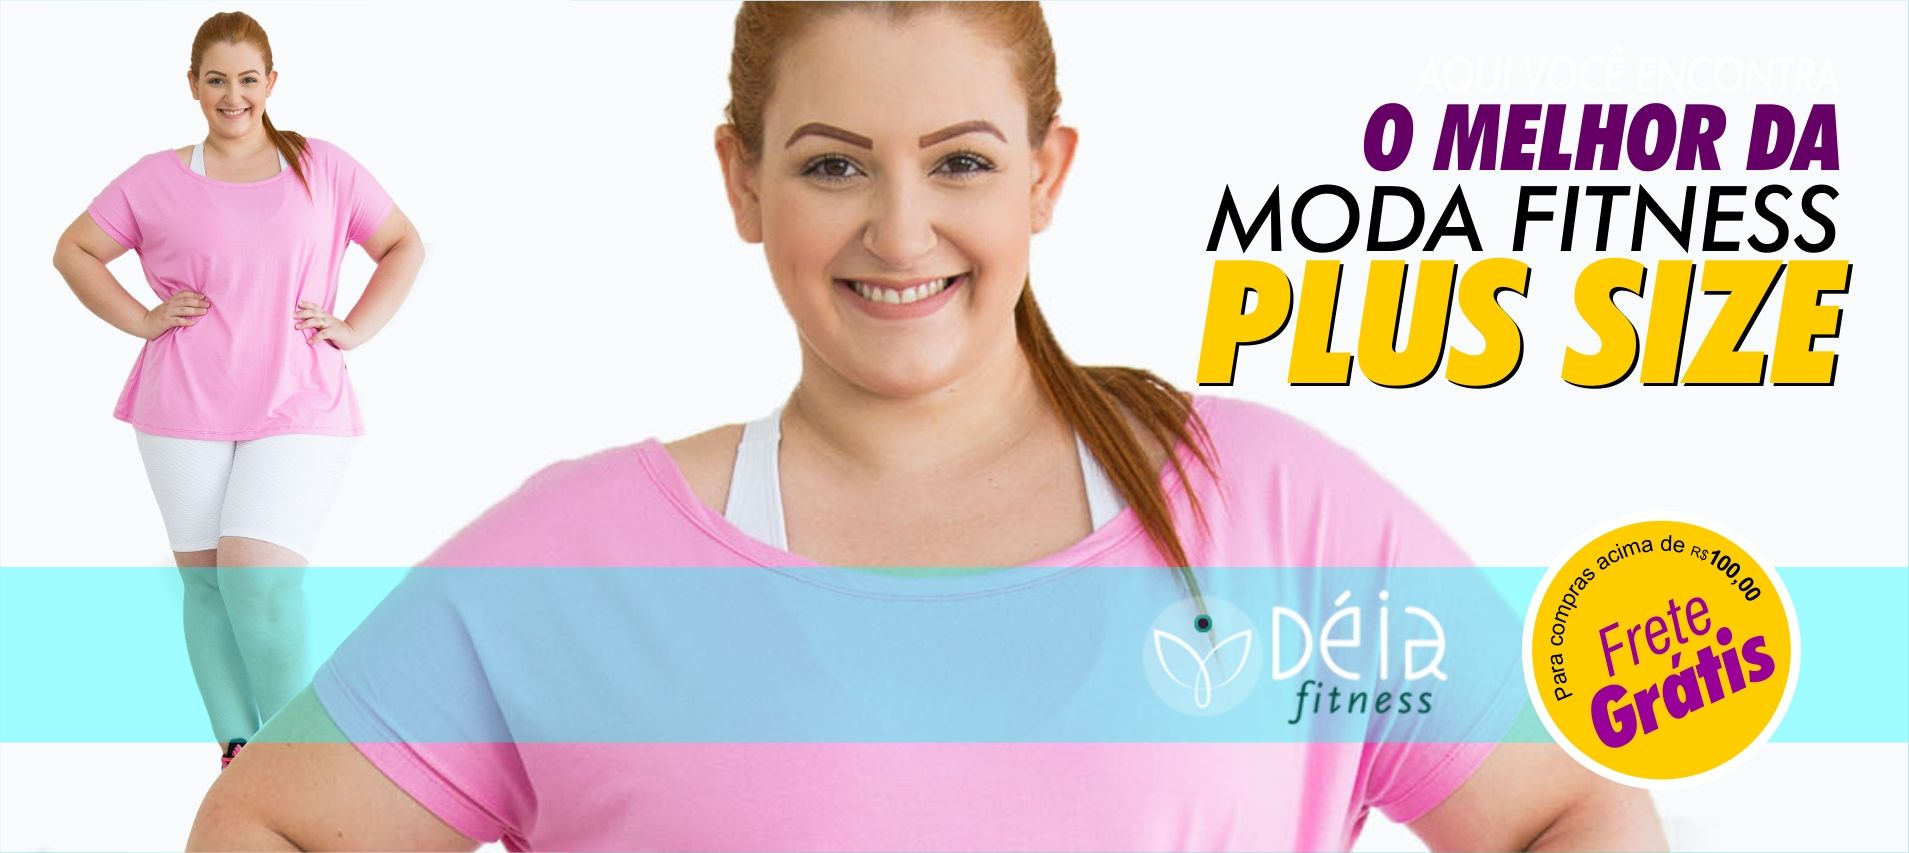 Moda Fitness Plus Size - Roupas de Ginástica   Déia Fitness